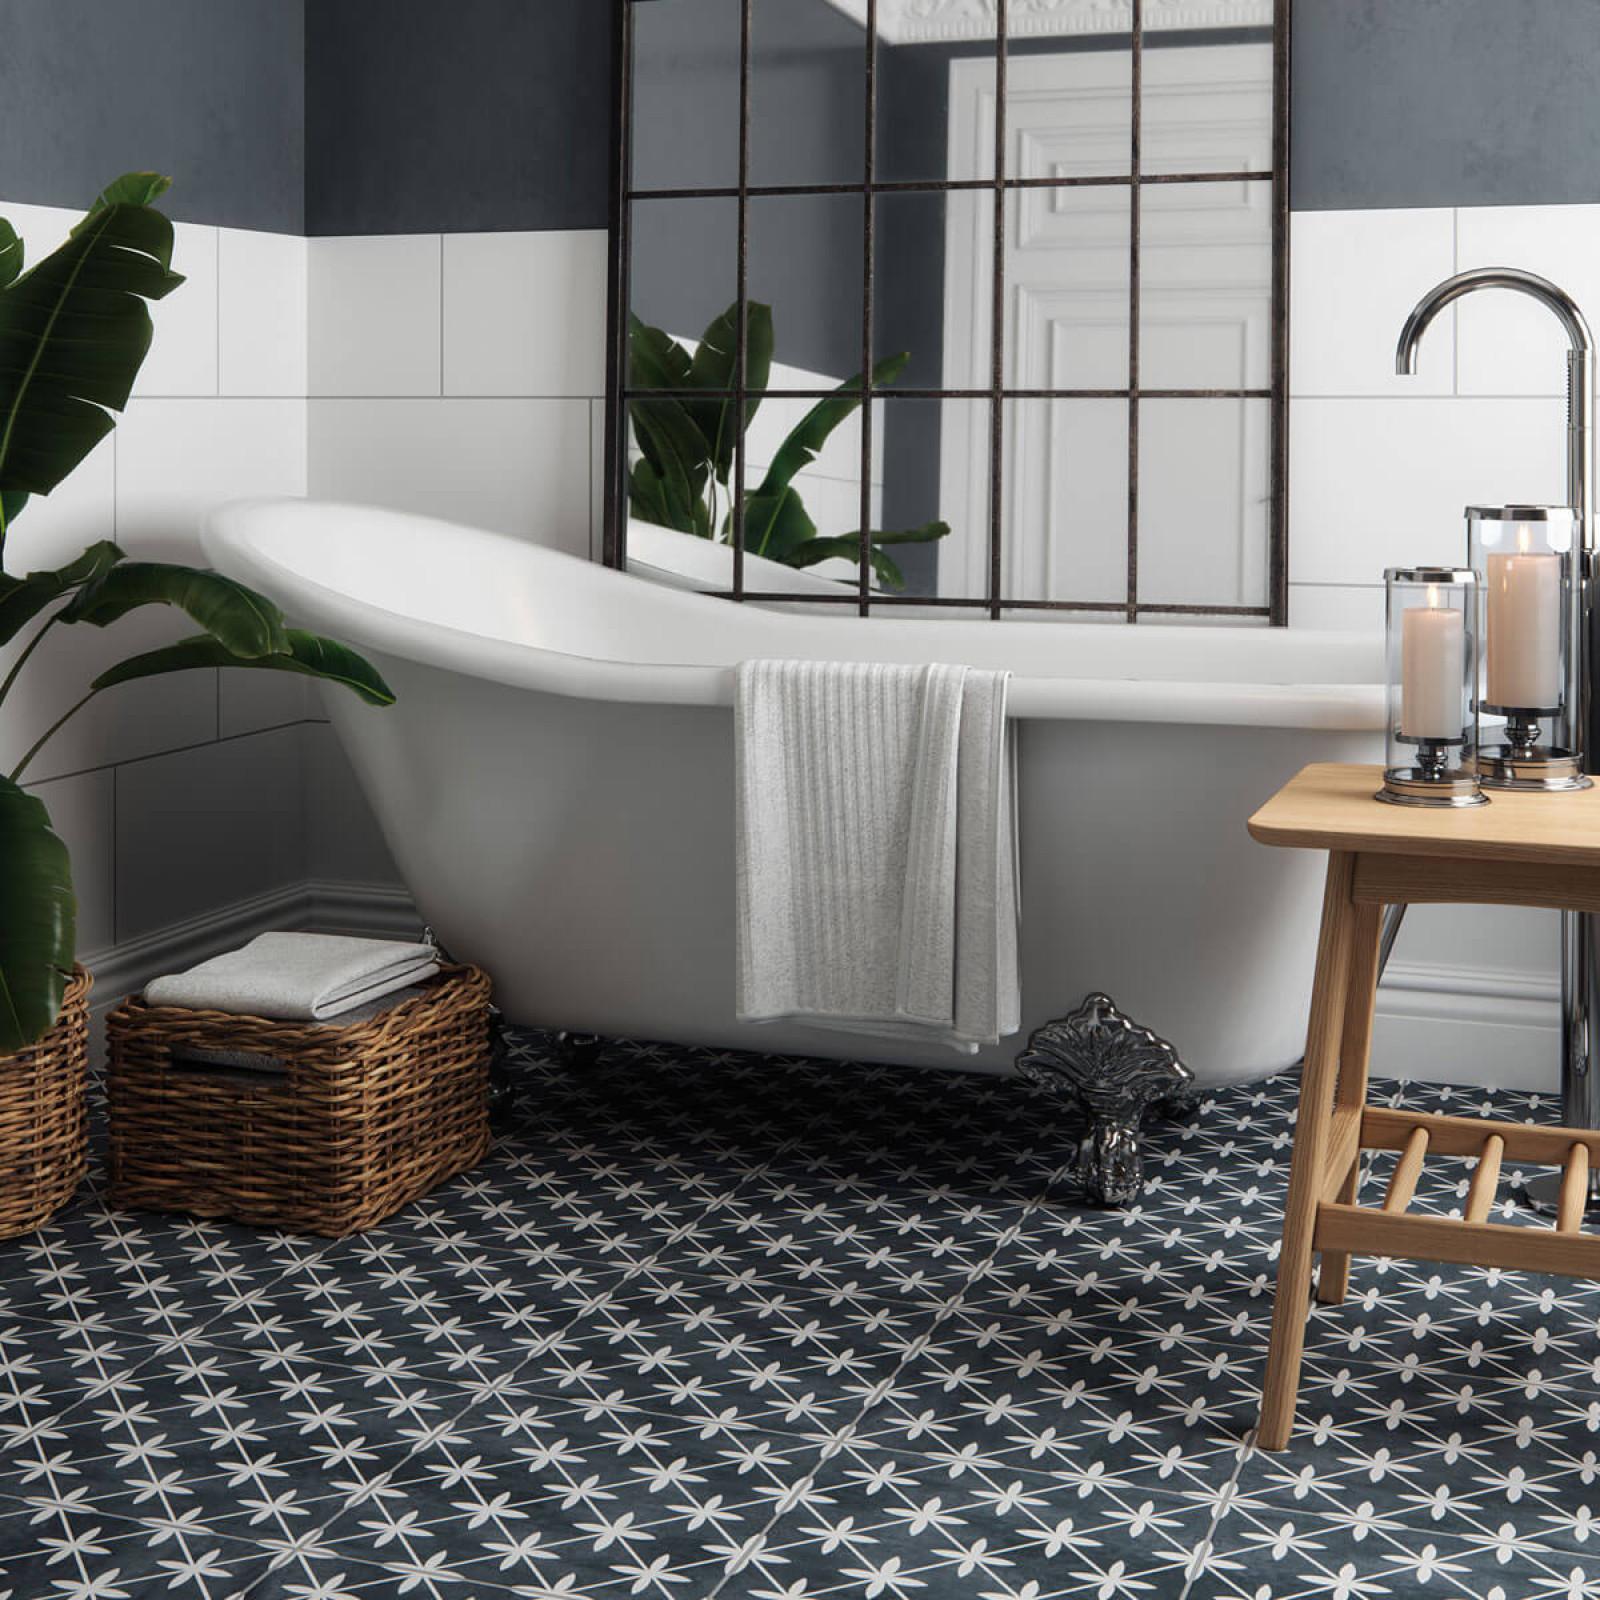 Wick Charcoal Furness Tiles